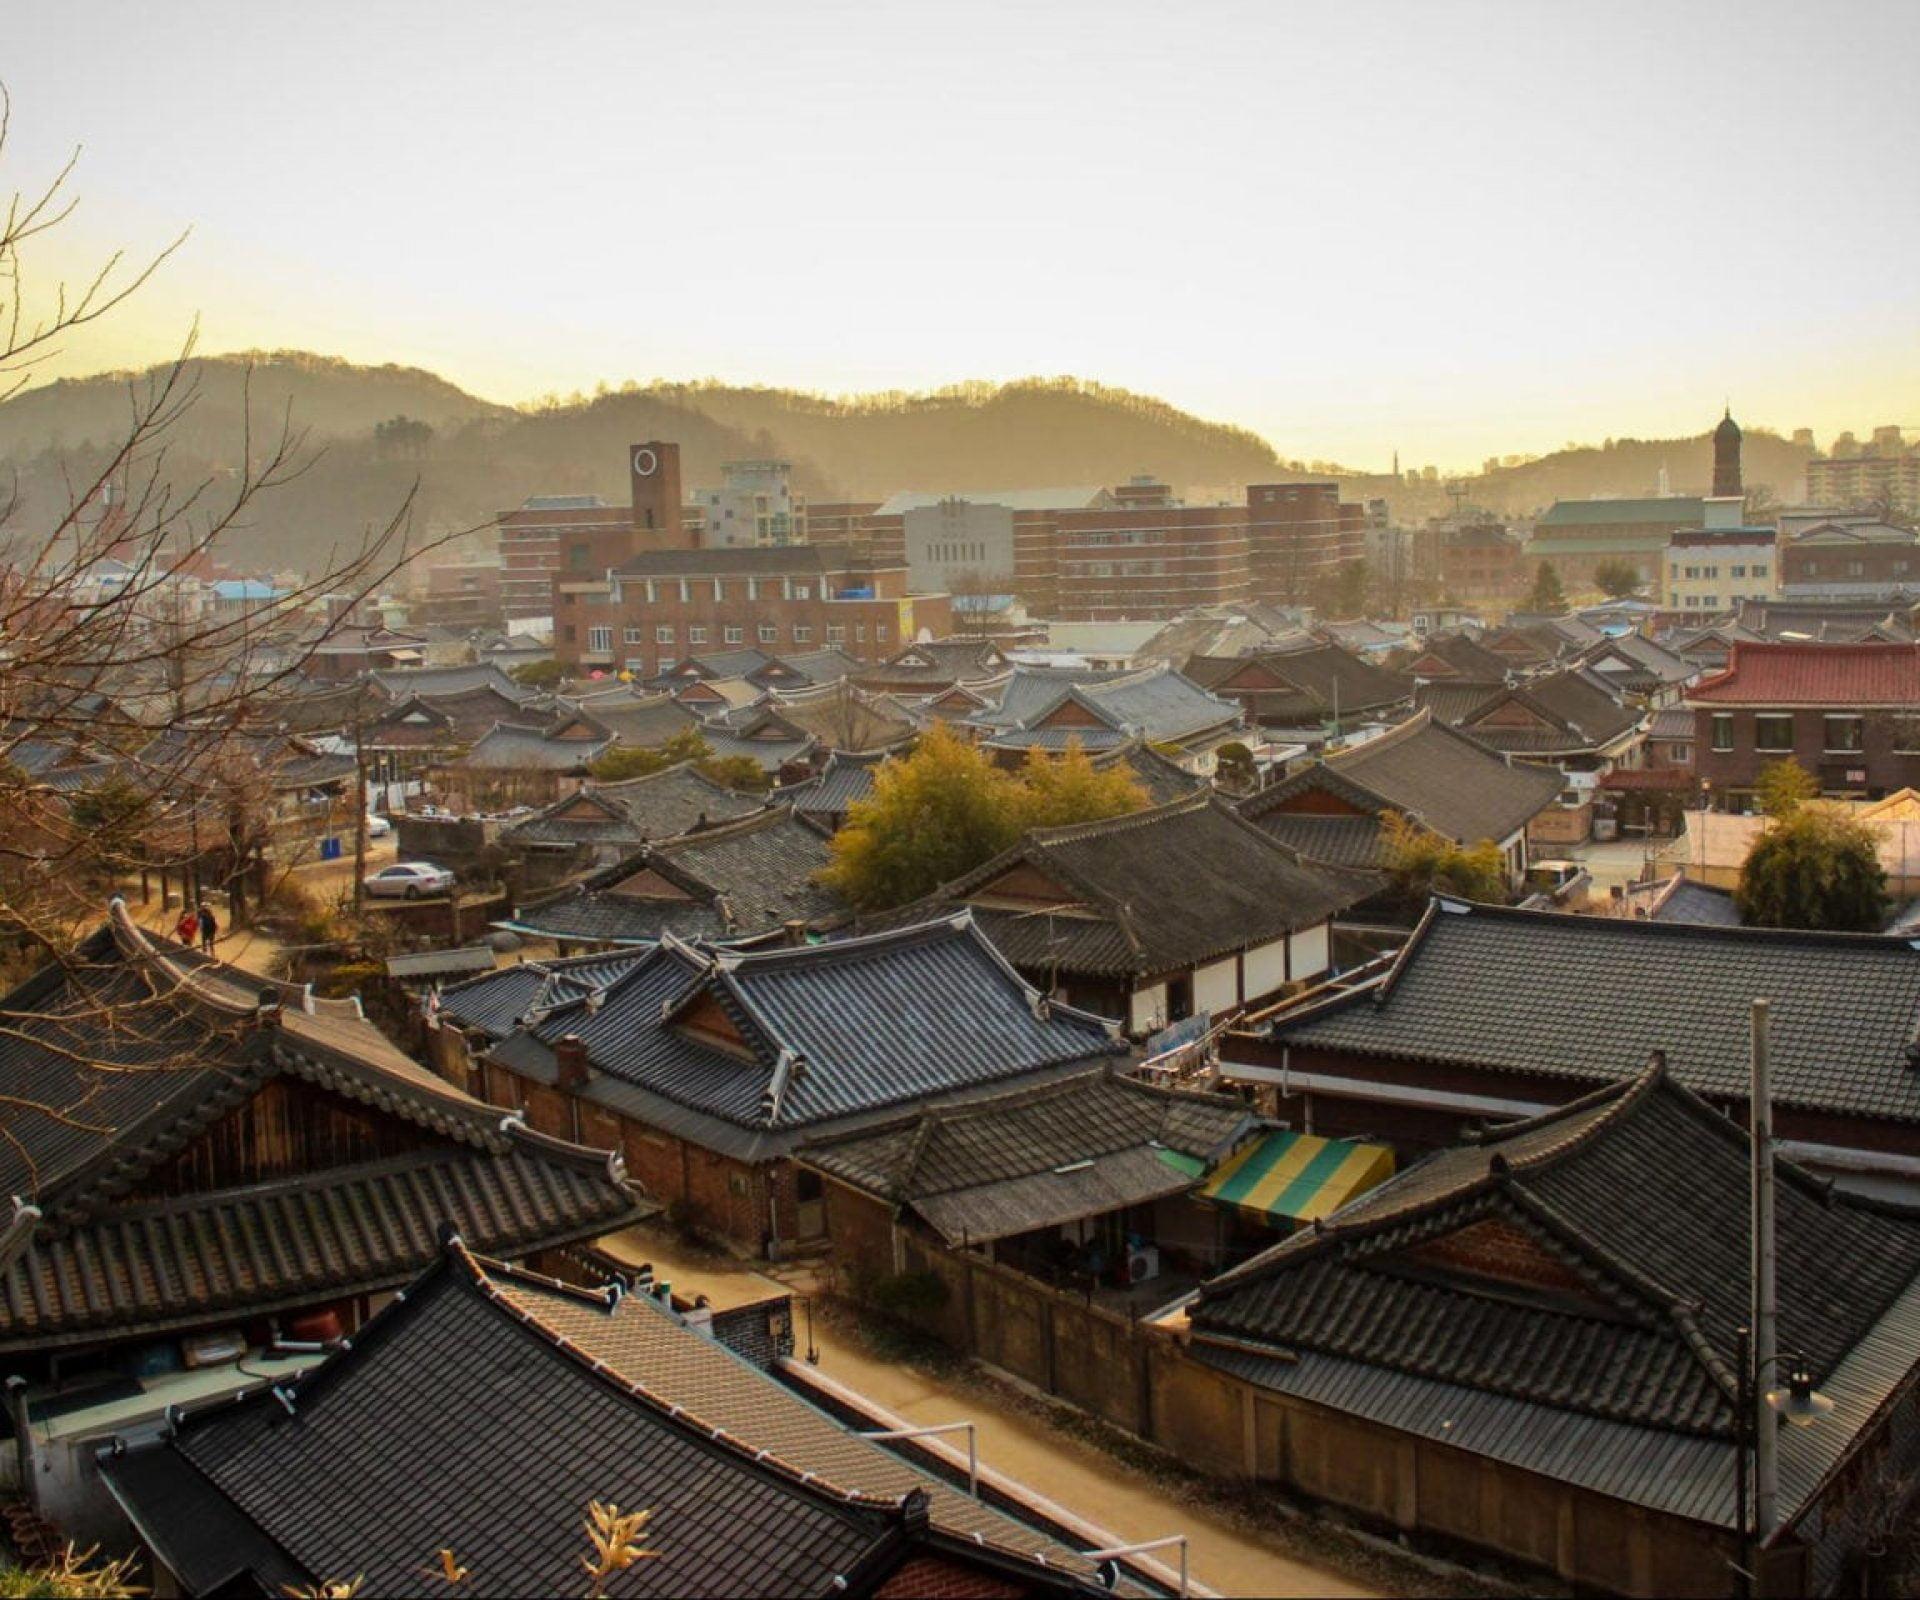 Jeonju Hanok Village | Wansan-gu, Jeollabuk-do